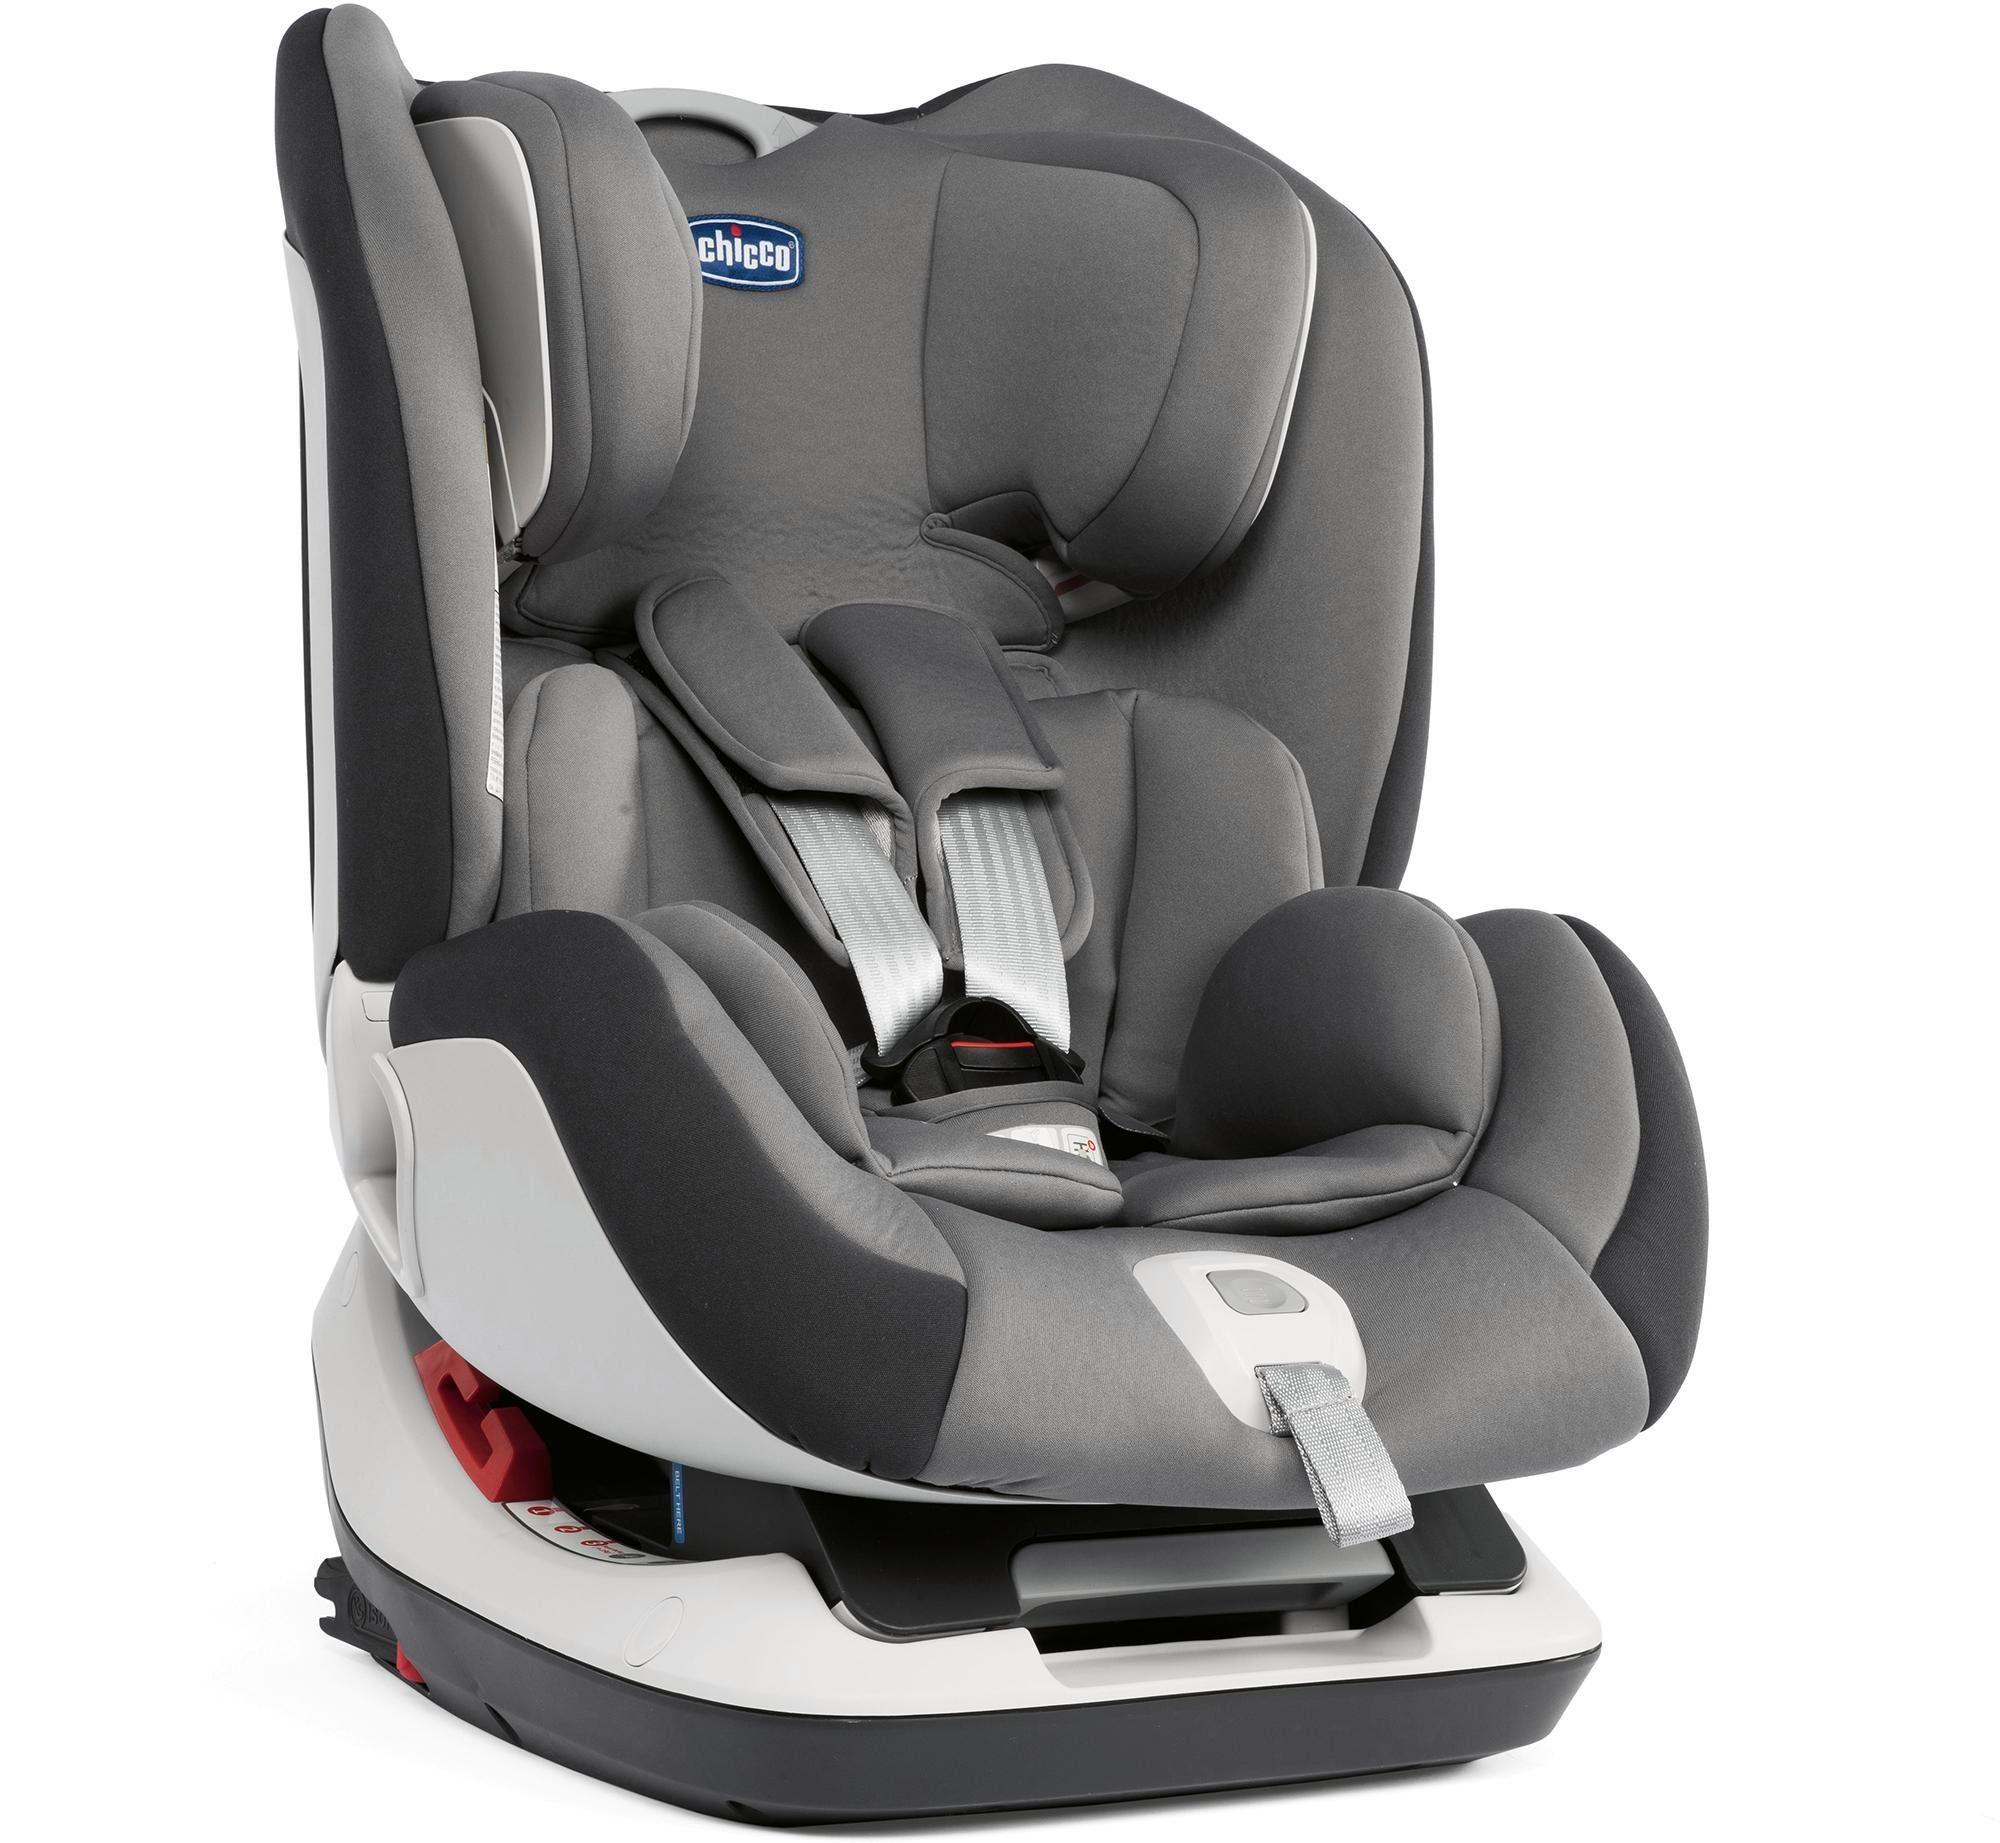 Chicco® Kindersitz, 0 - 25 kg, »Seat Up 012, Stone«